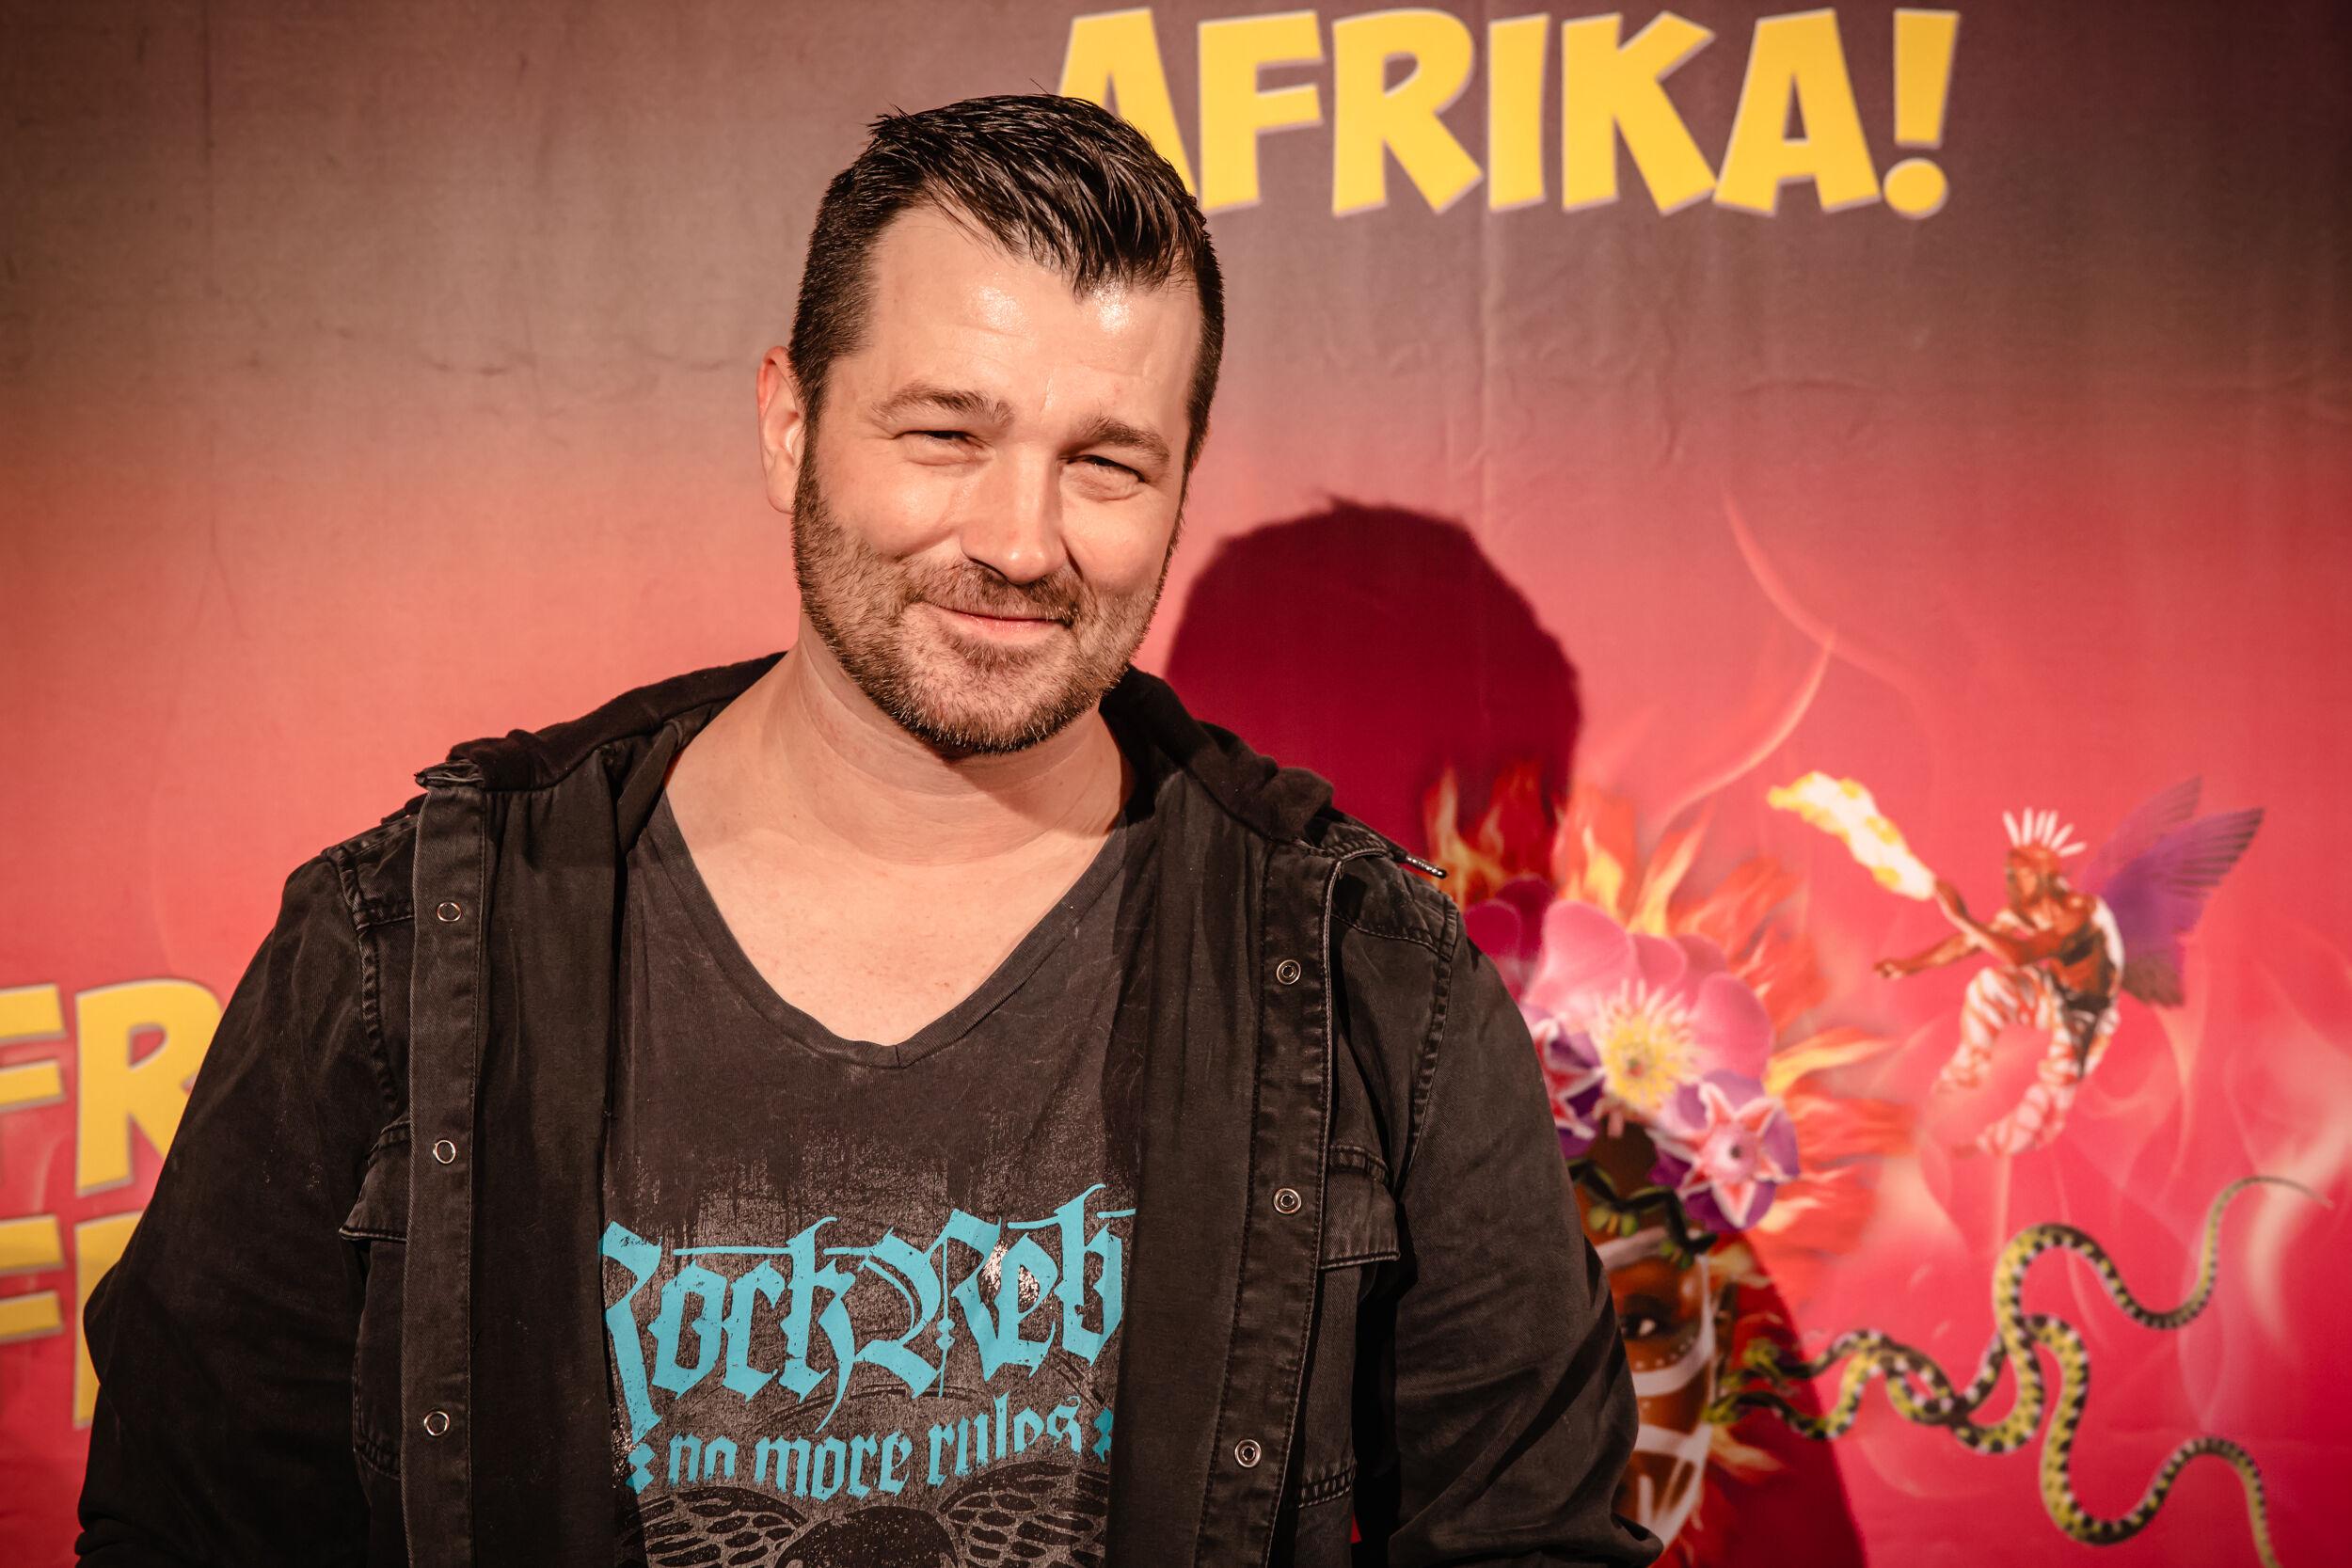 AFRIKA! AFRIKA! - CAPITOL THEATER DÜSSELDORF   03.2019 by Dita Vollmond